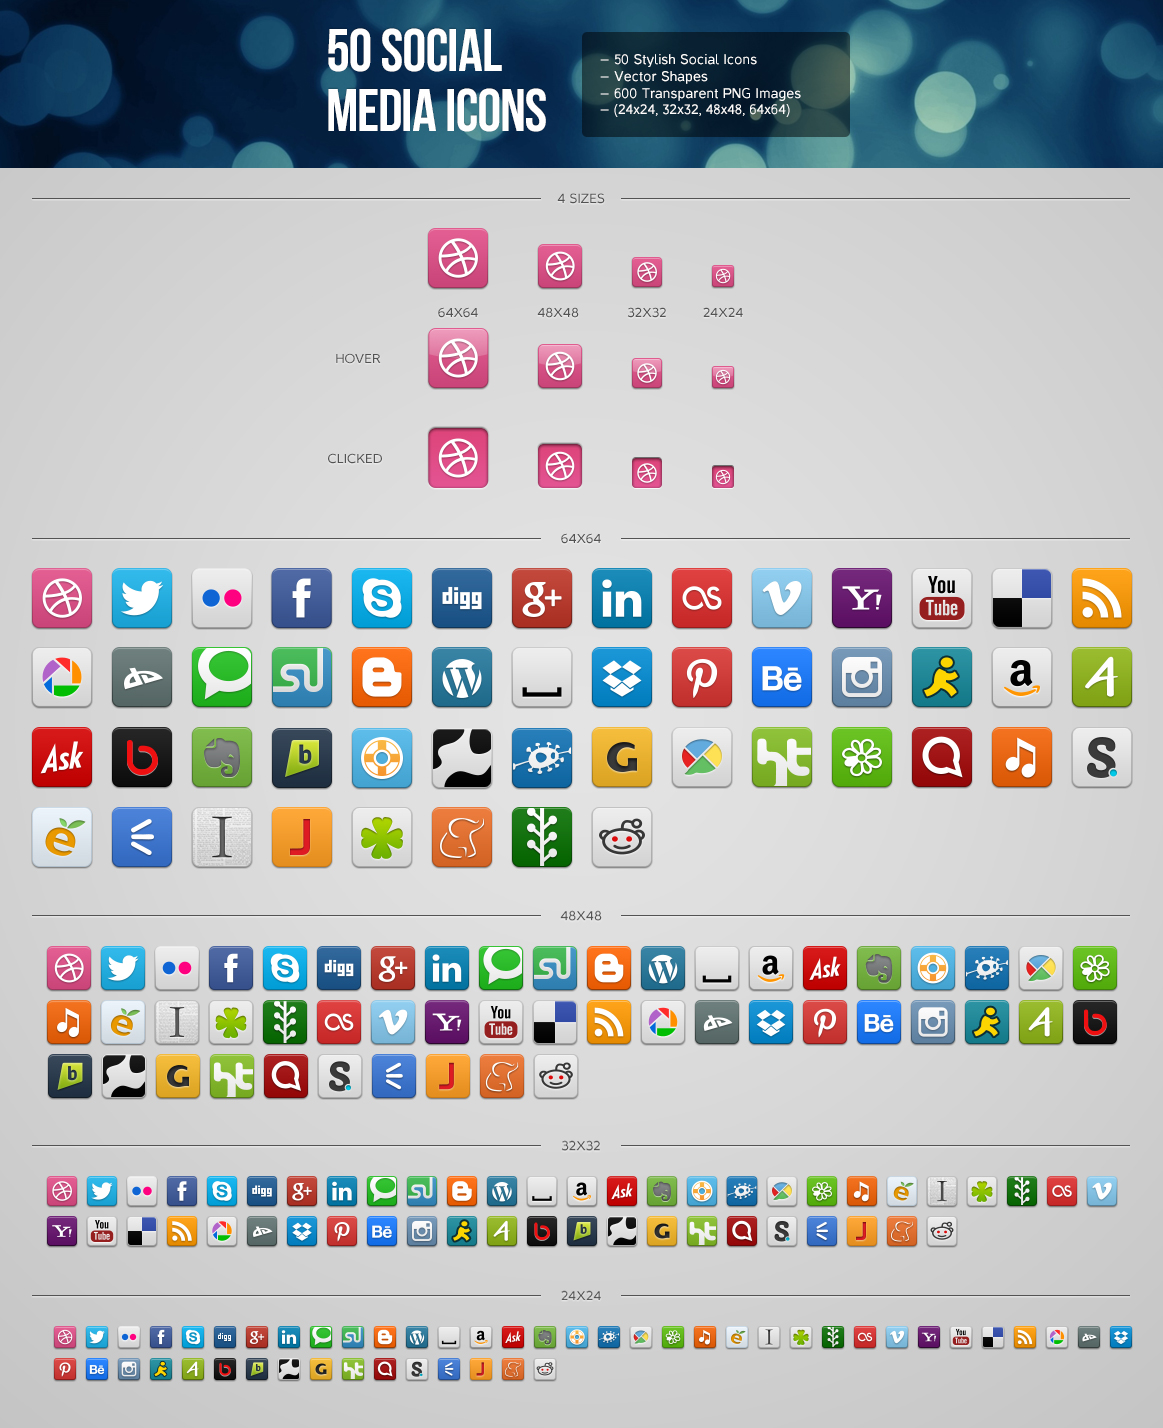 50_social_media_icons_1